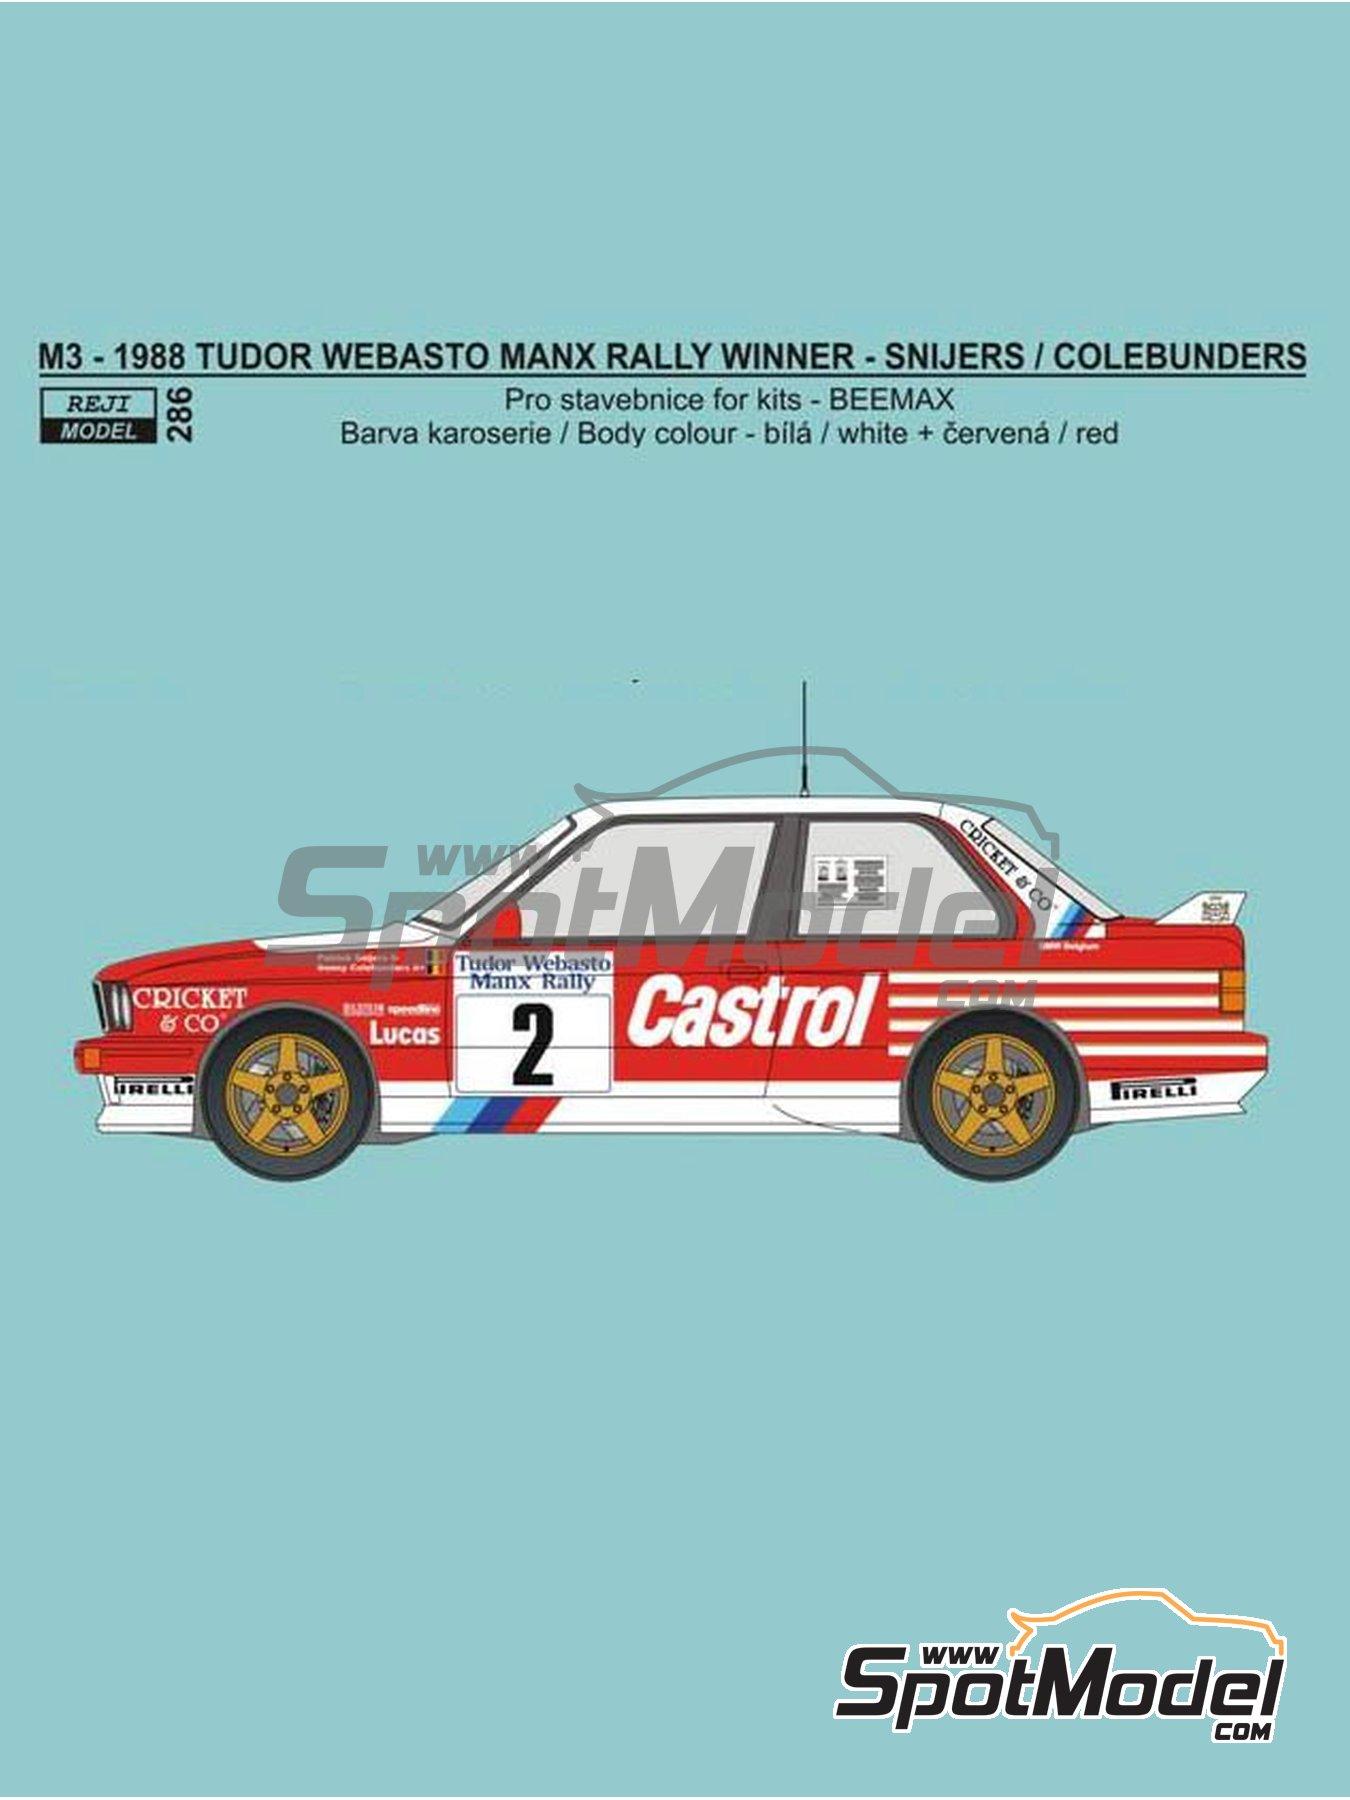 BMW M3 E30 Rally Castrol - Tudor Webasto Manx International Rally 1988 | Marking / livery in 1/24 scale manufactured by Reji Model (ref.REJI-286) image